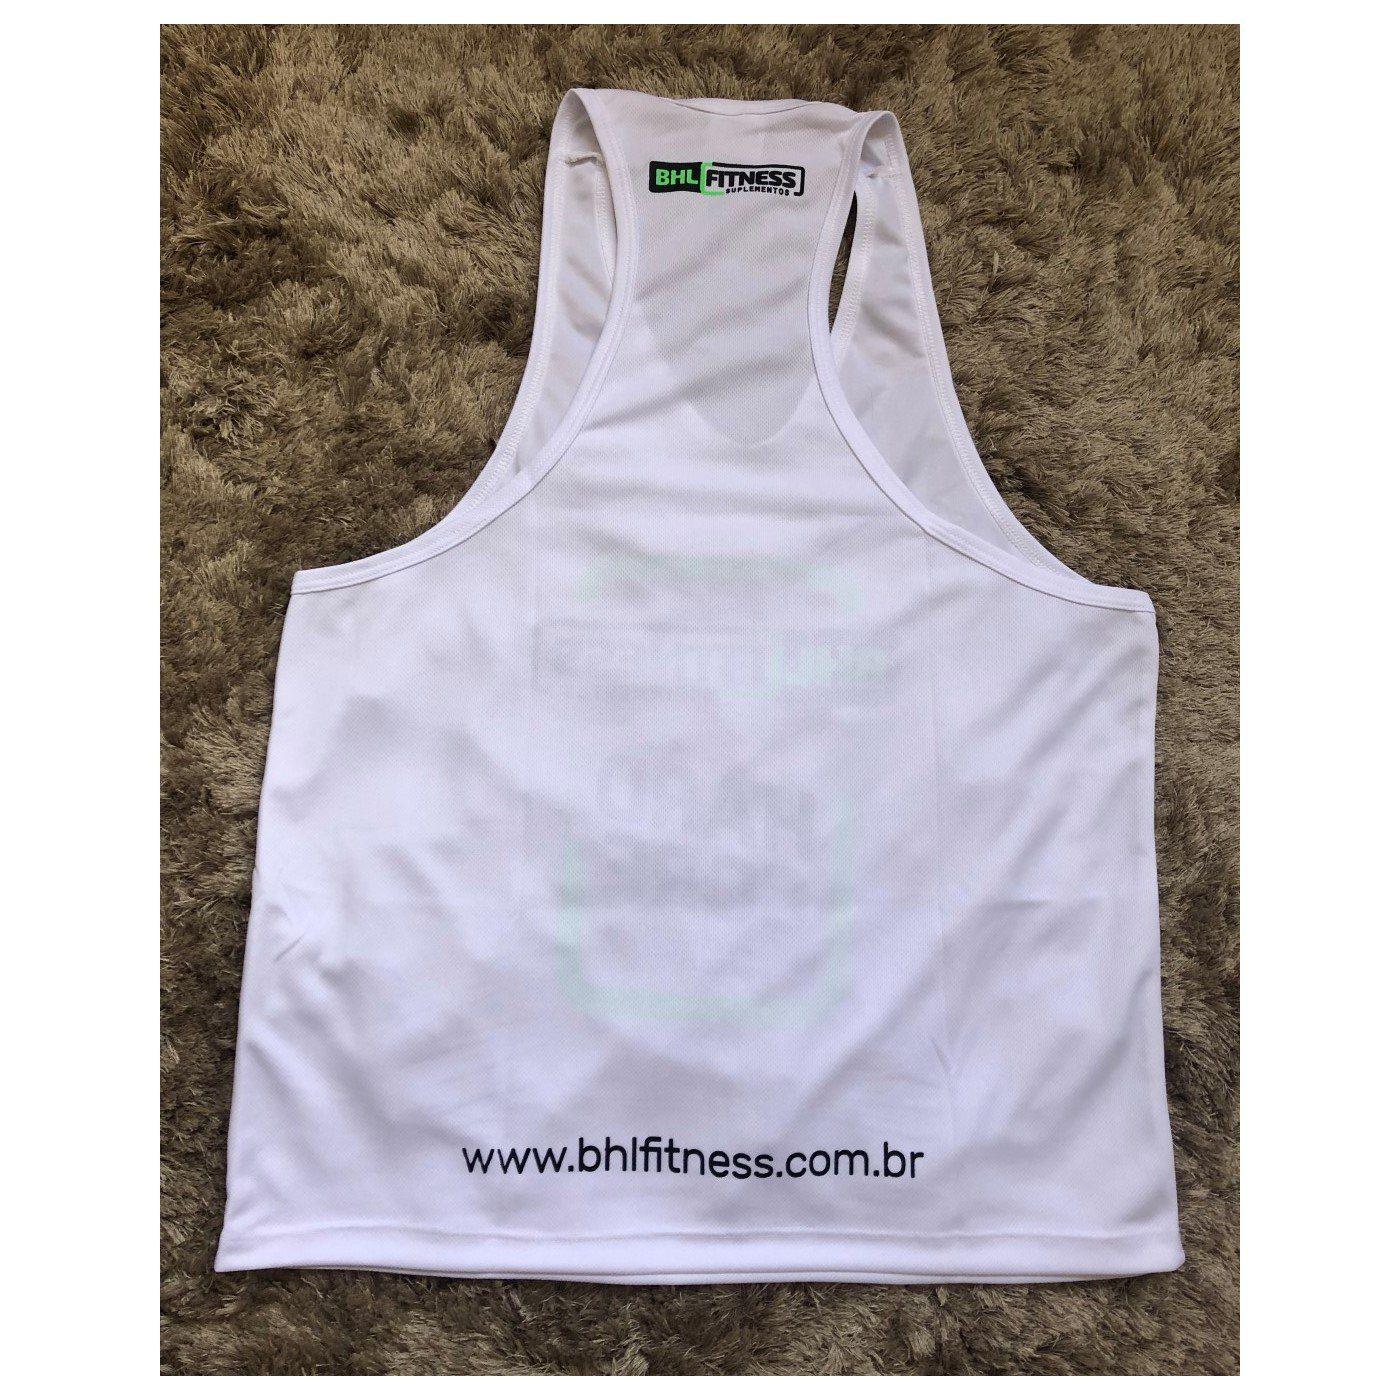 8e876769deefb Regata Cavada (Branca) - BHL Fitness